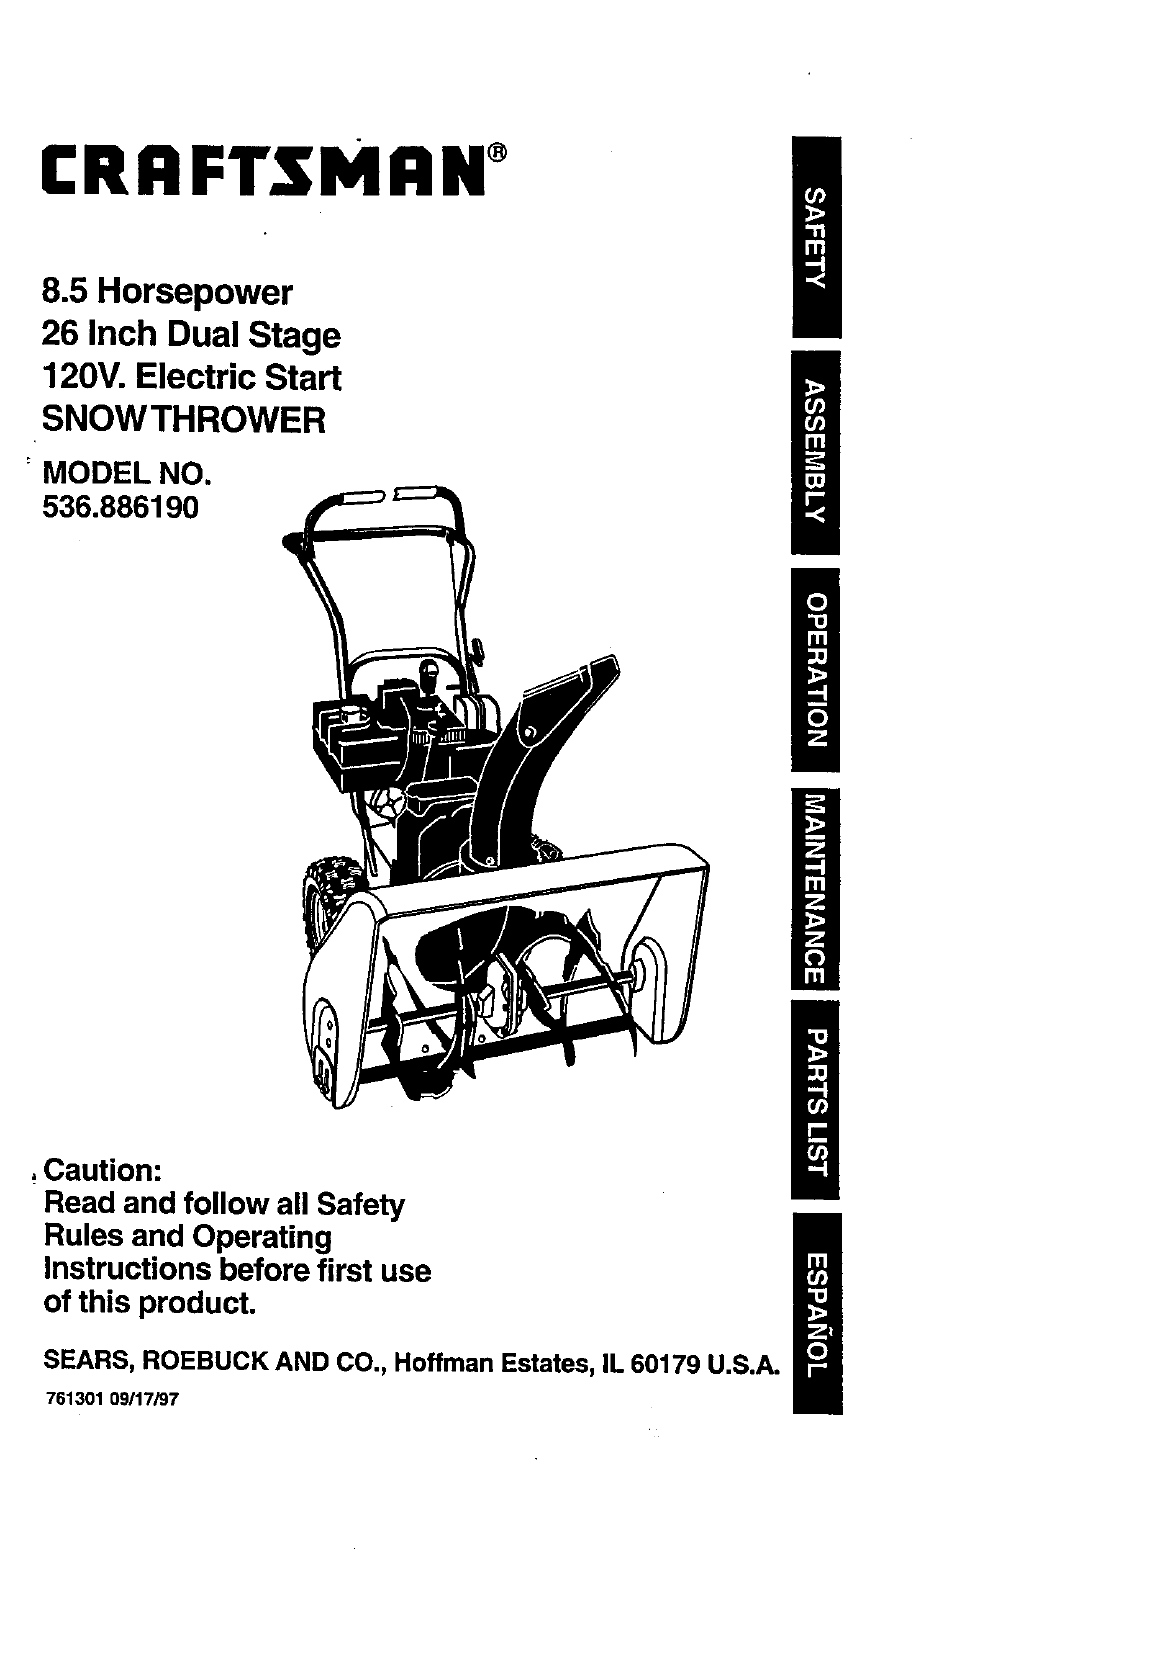 craftsman 12.5 33 snowblower manual